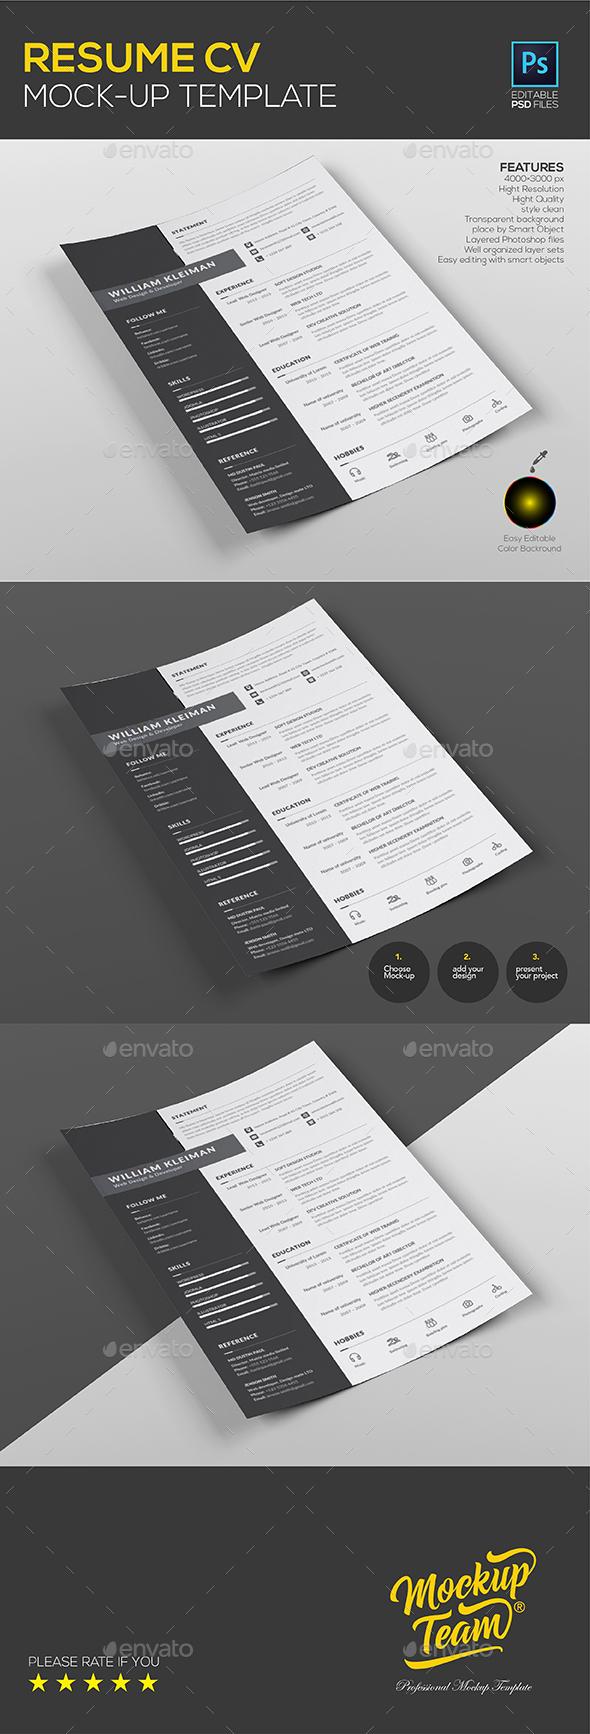 Resume CV Mock up Template - Print Product Mock-Ups